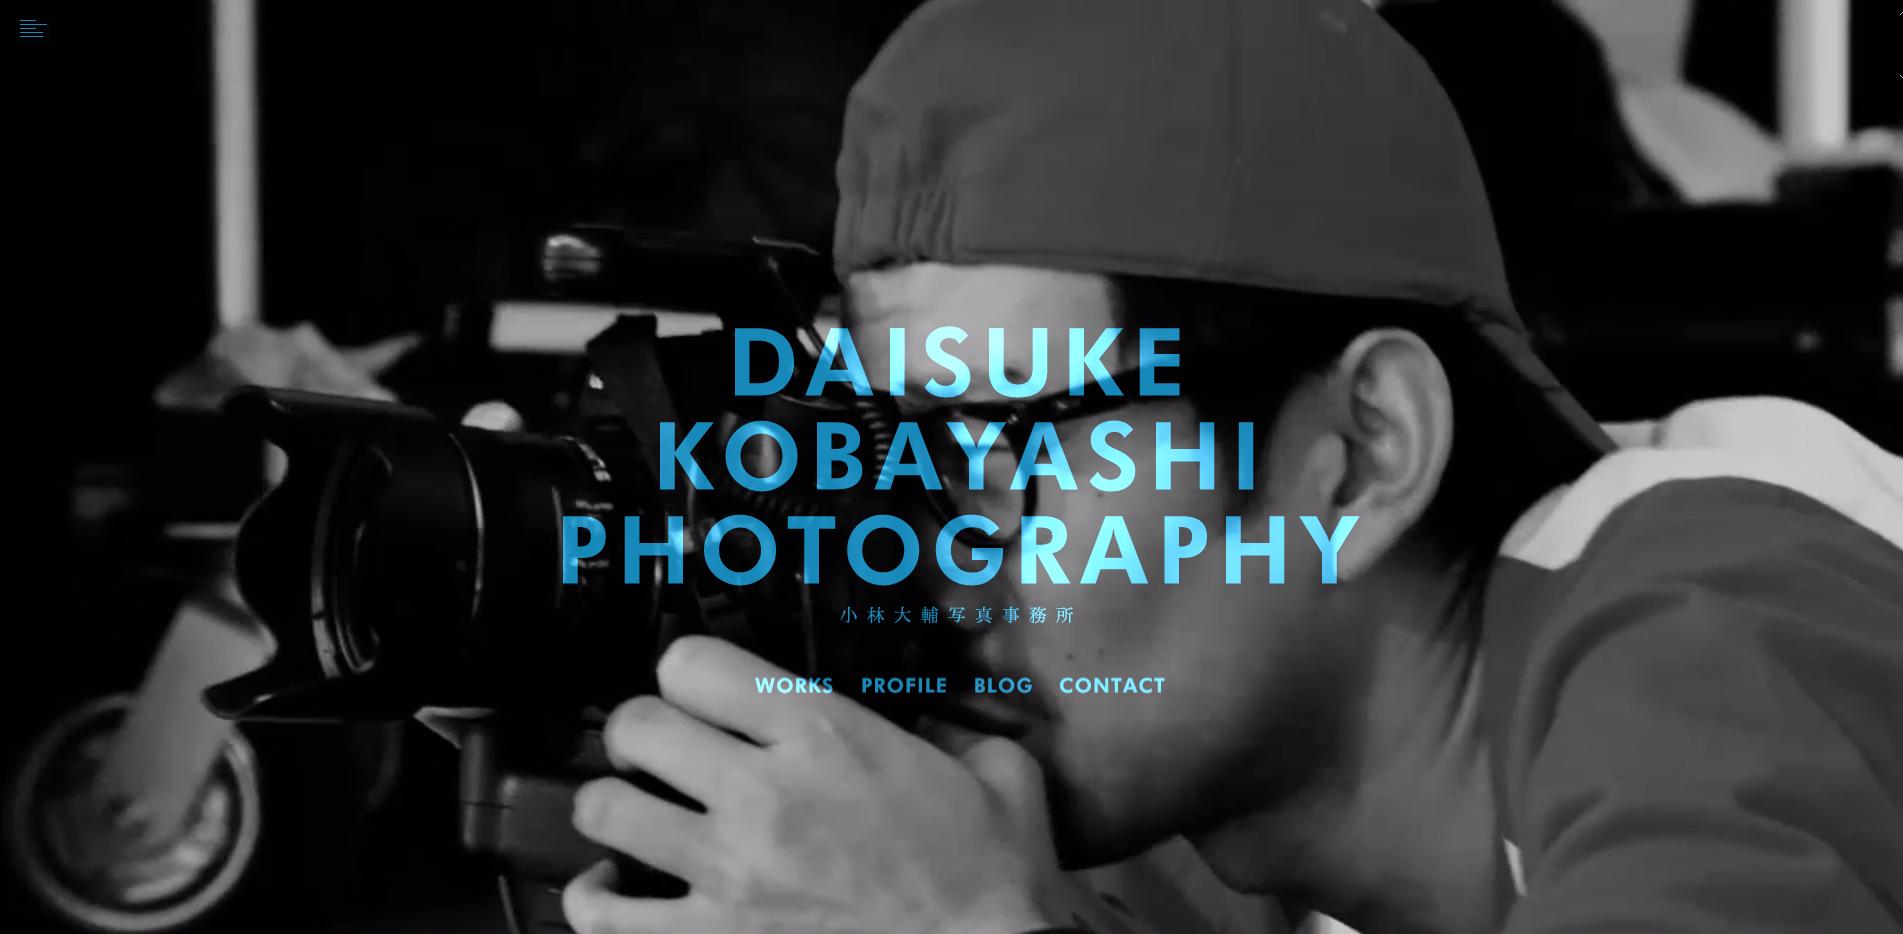 Photography-Websites-Inspiration-007